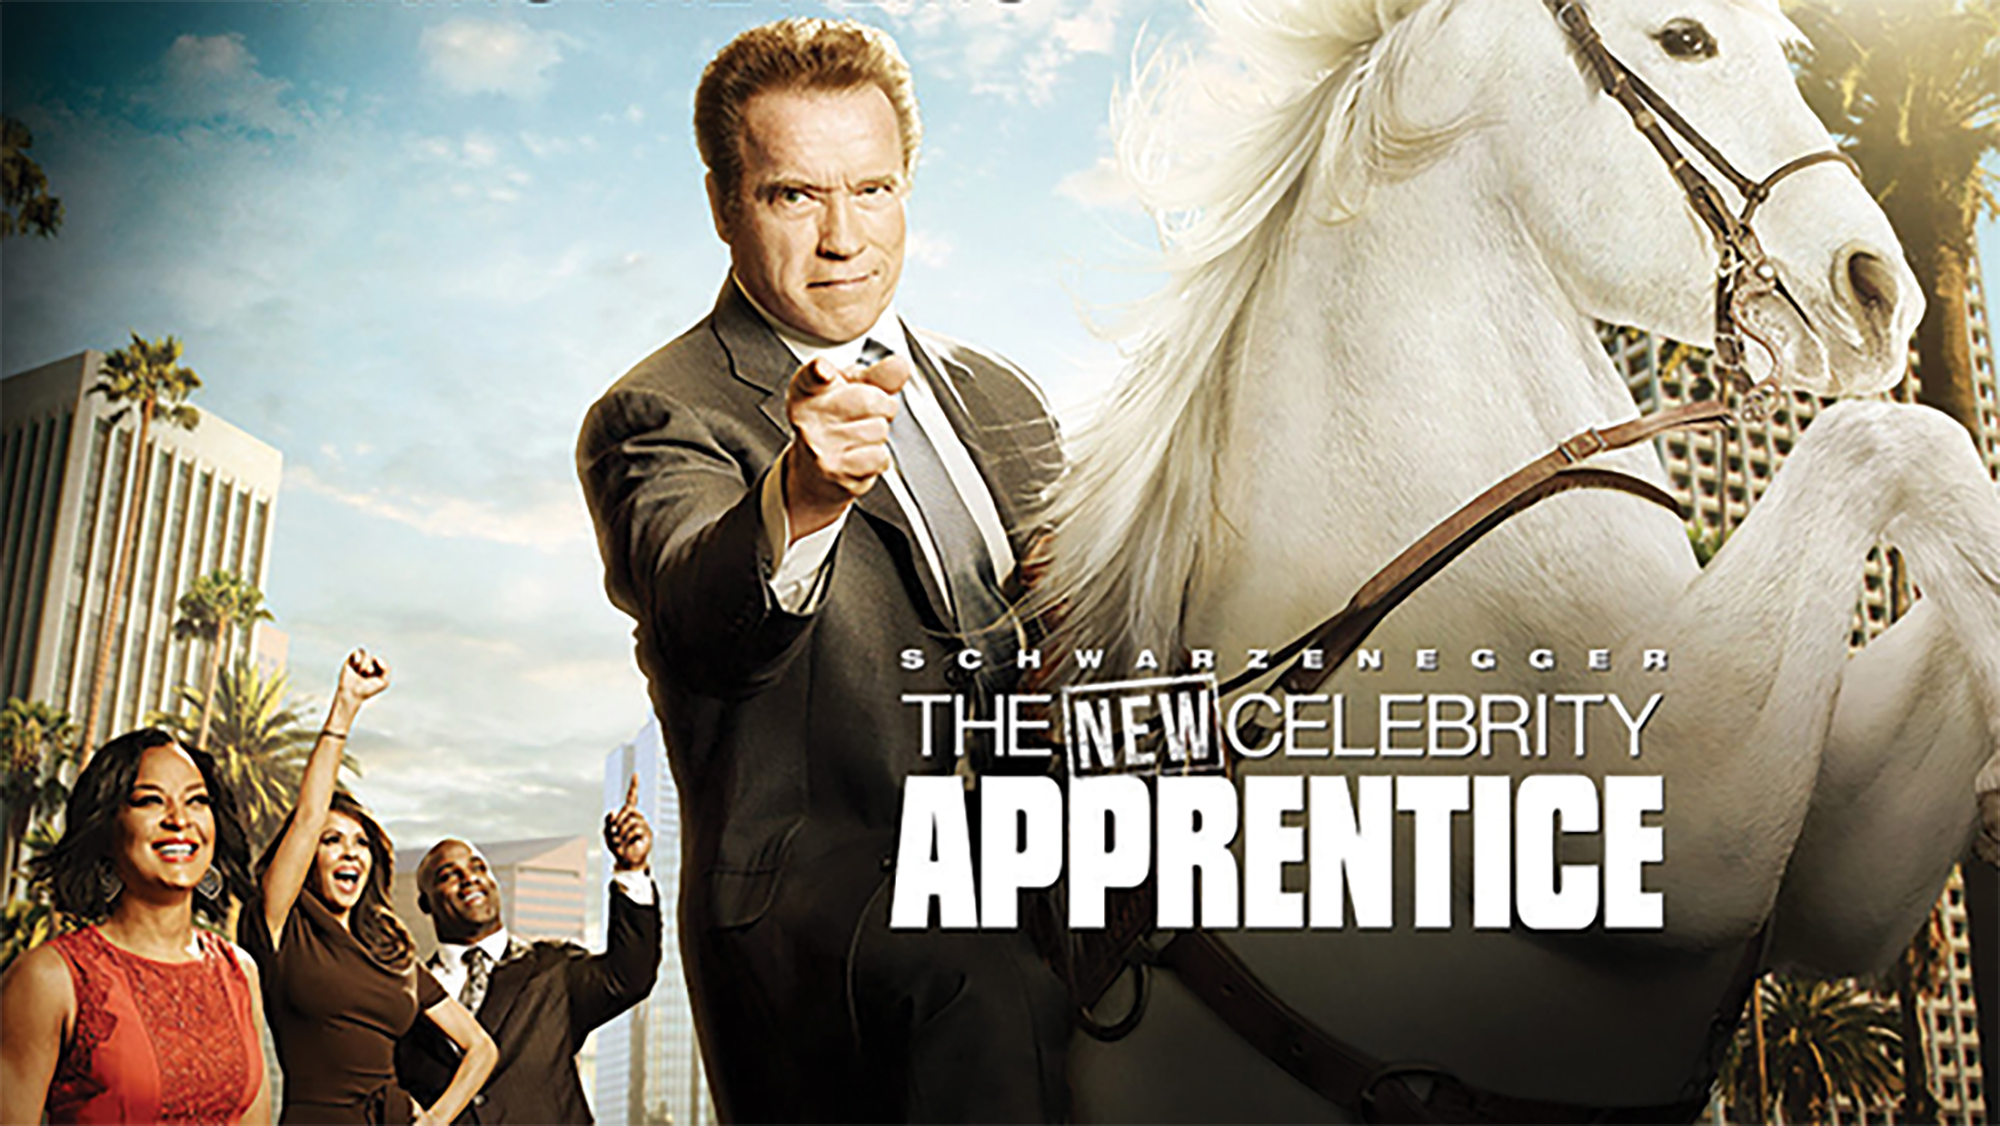 The New Celebrity Apprentice